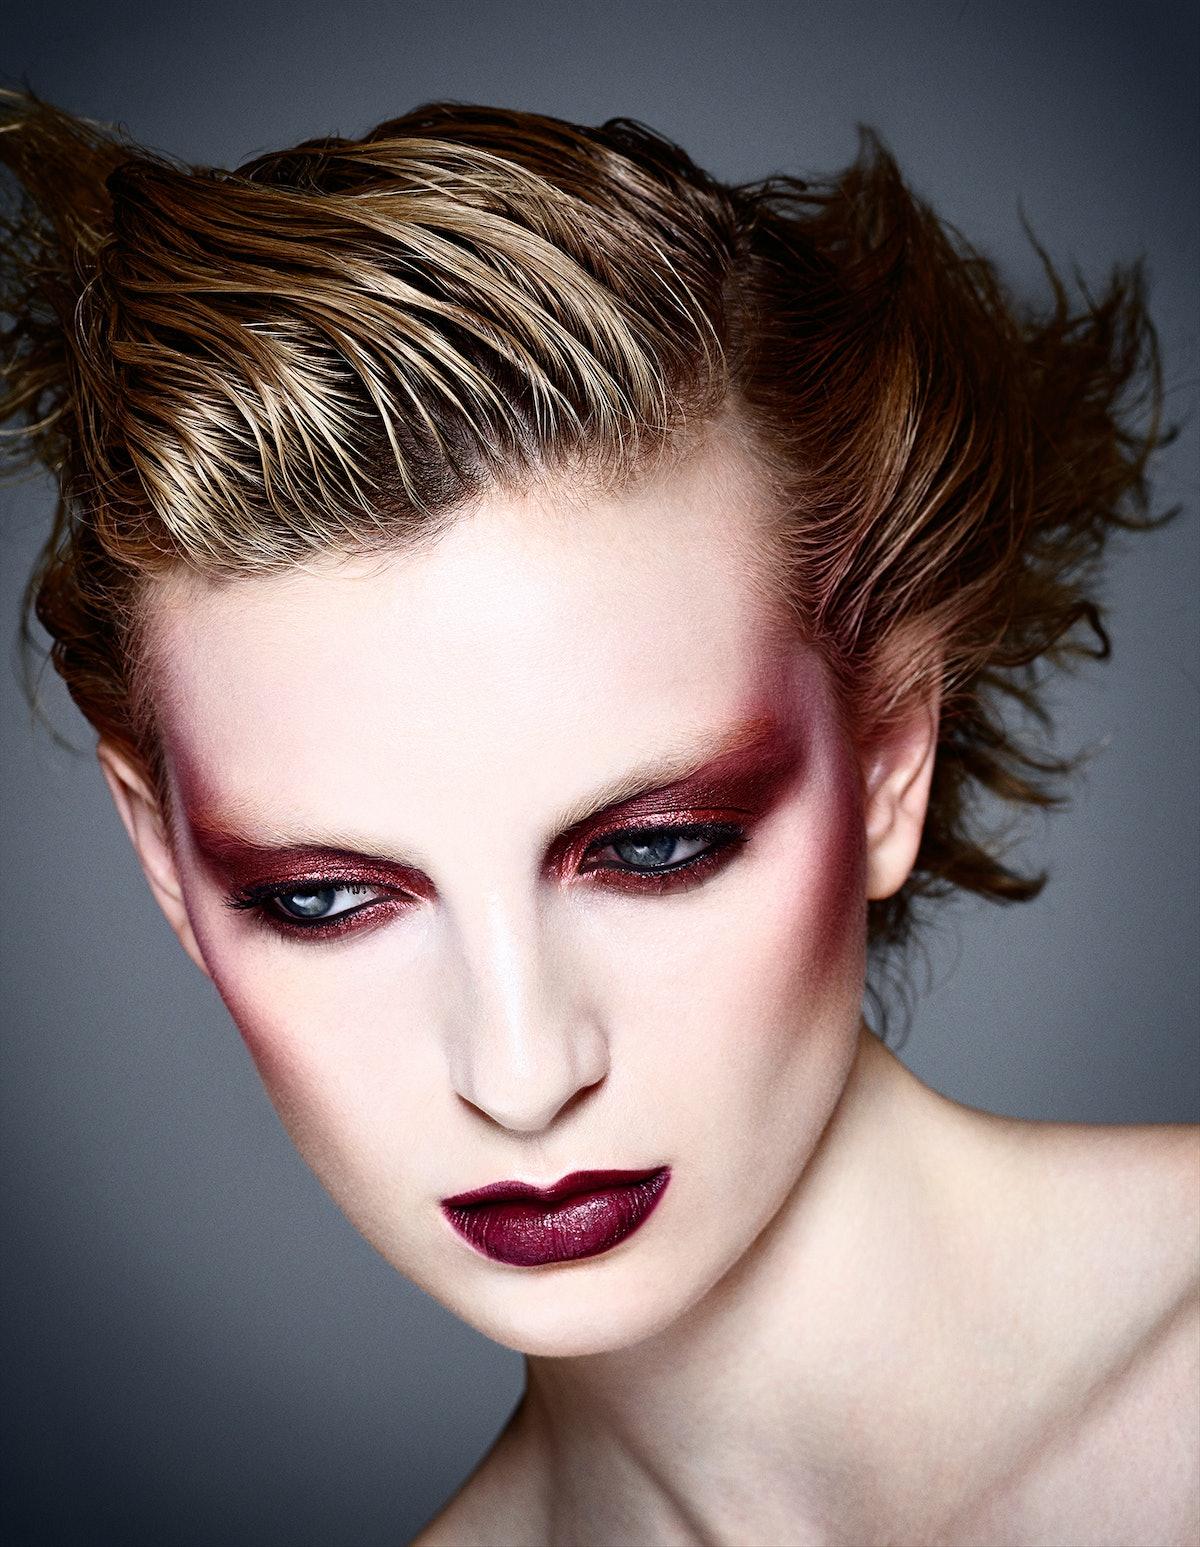 How to Wear Glitter Eyeshadow